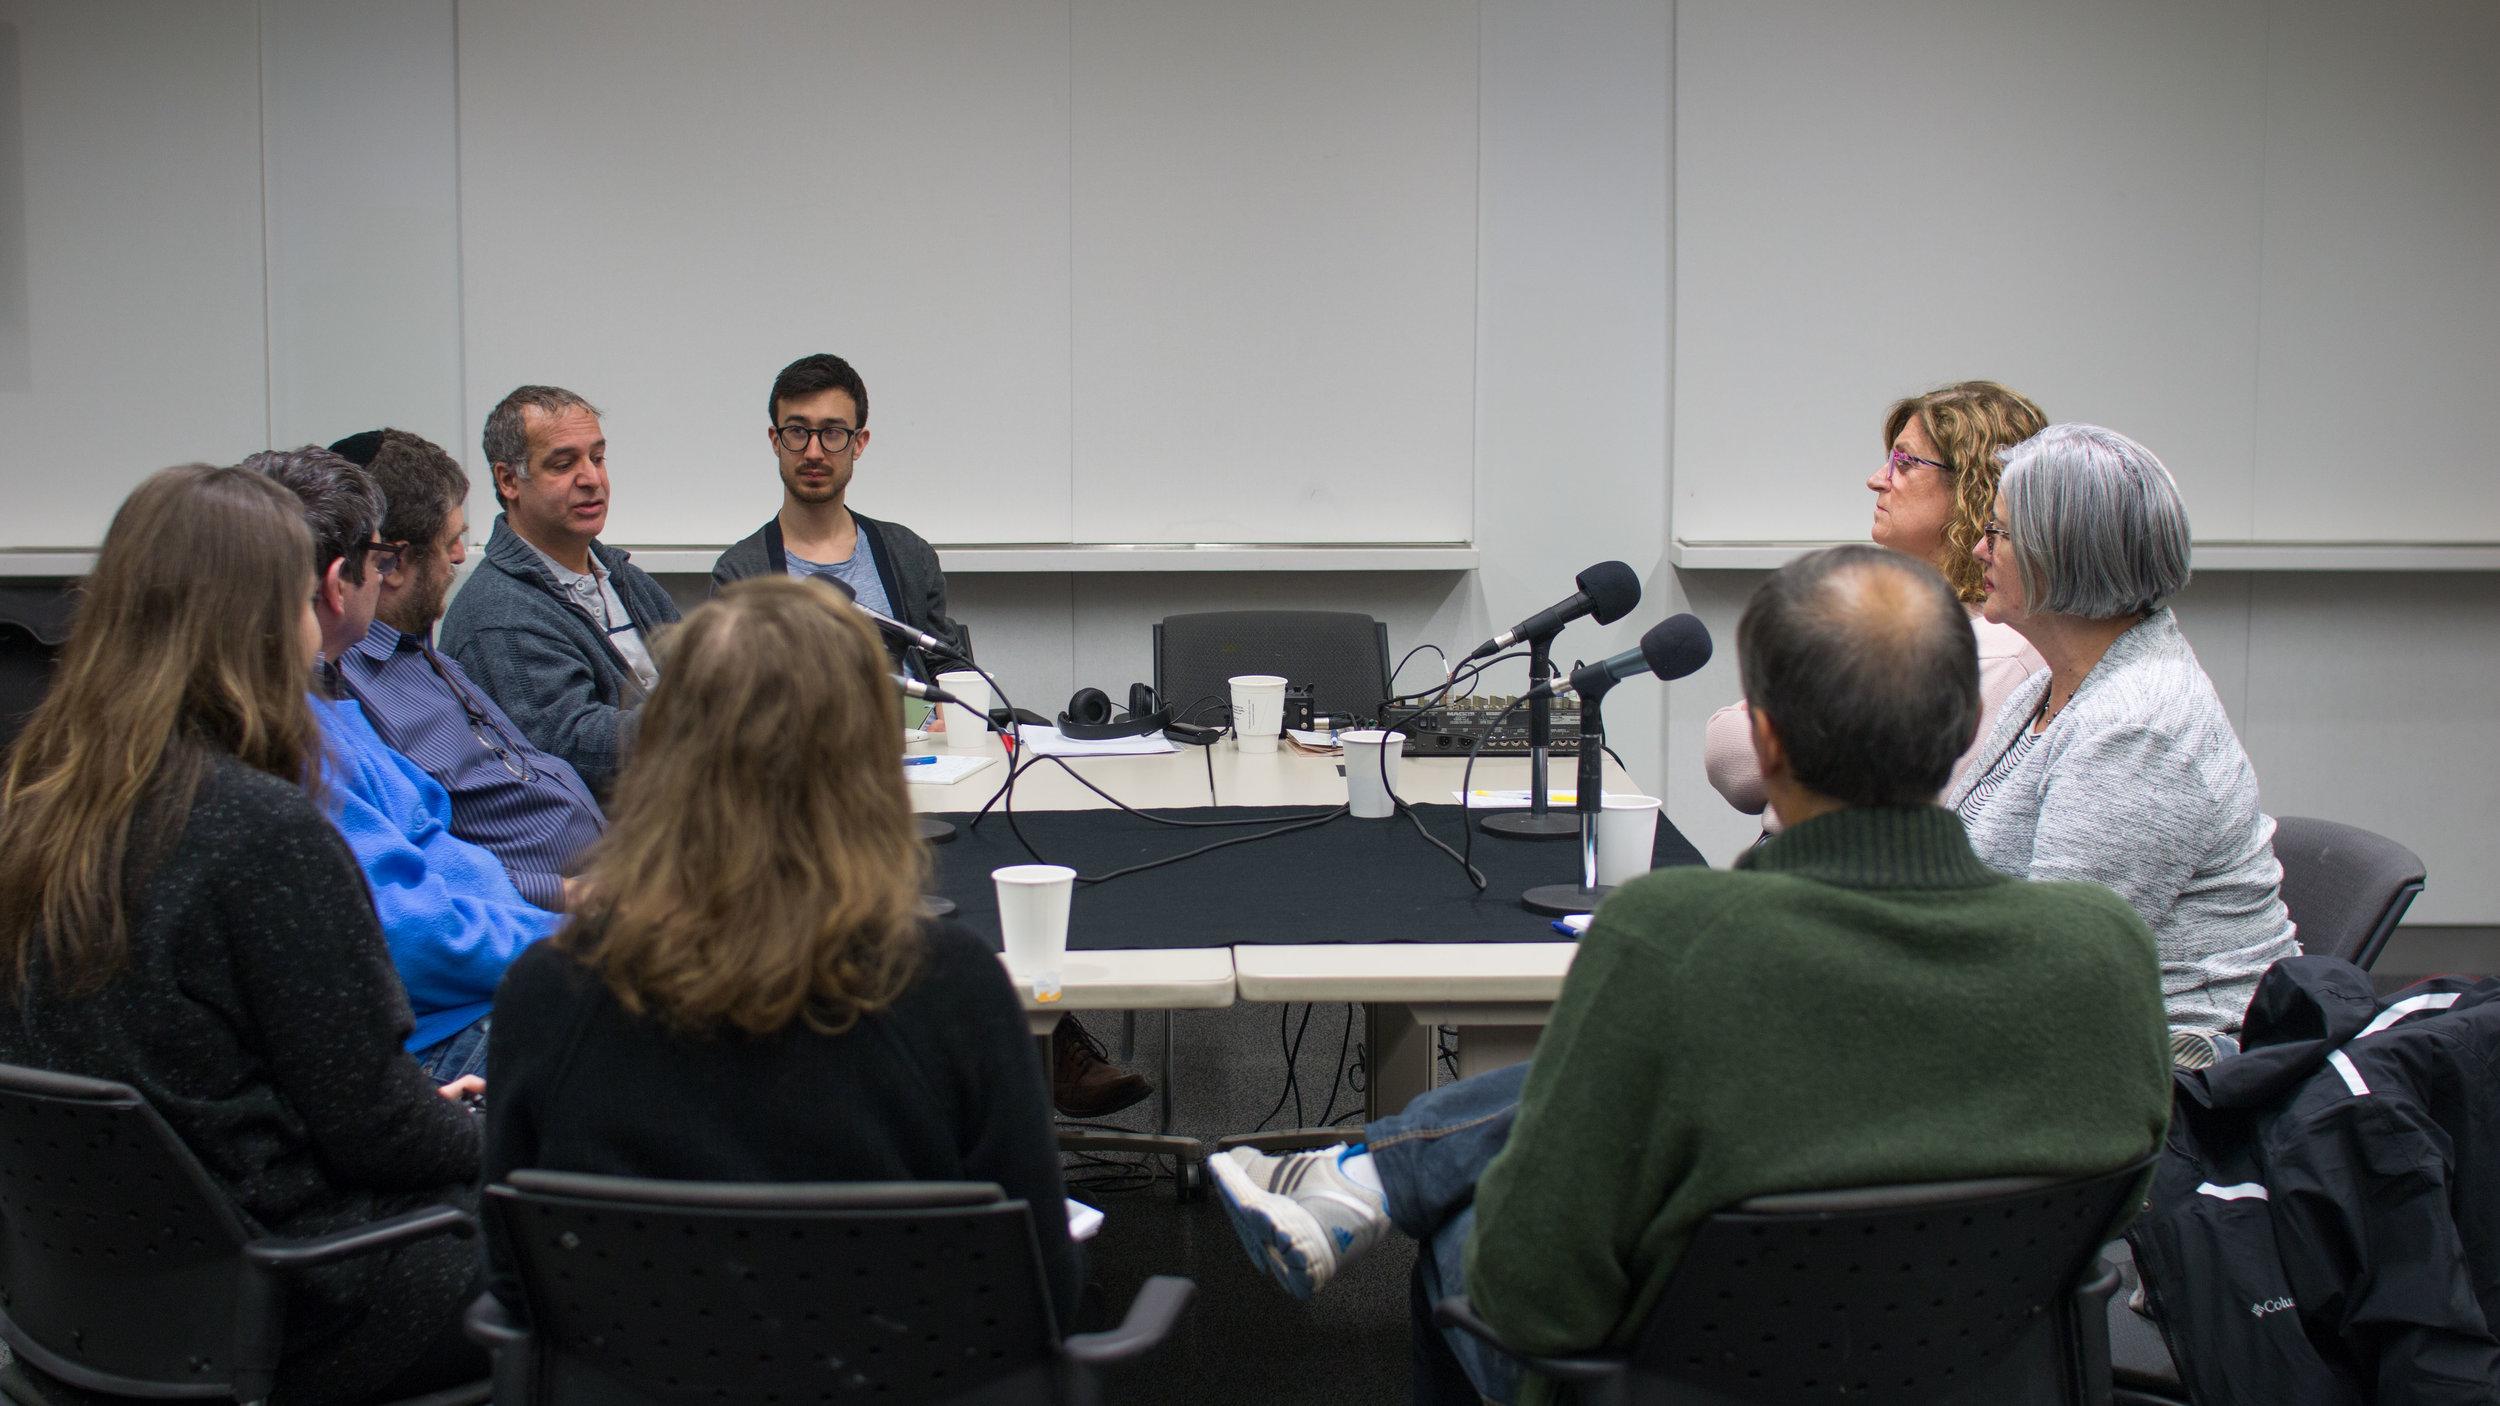 JCC Workshop Group Interview With Aidan Morshita-Miki